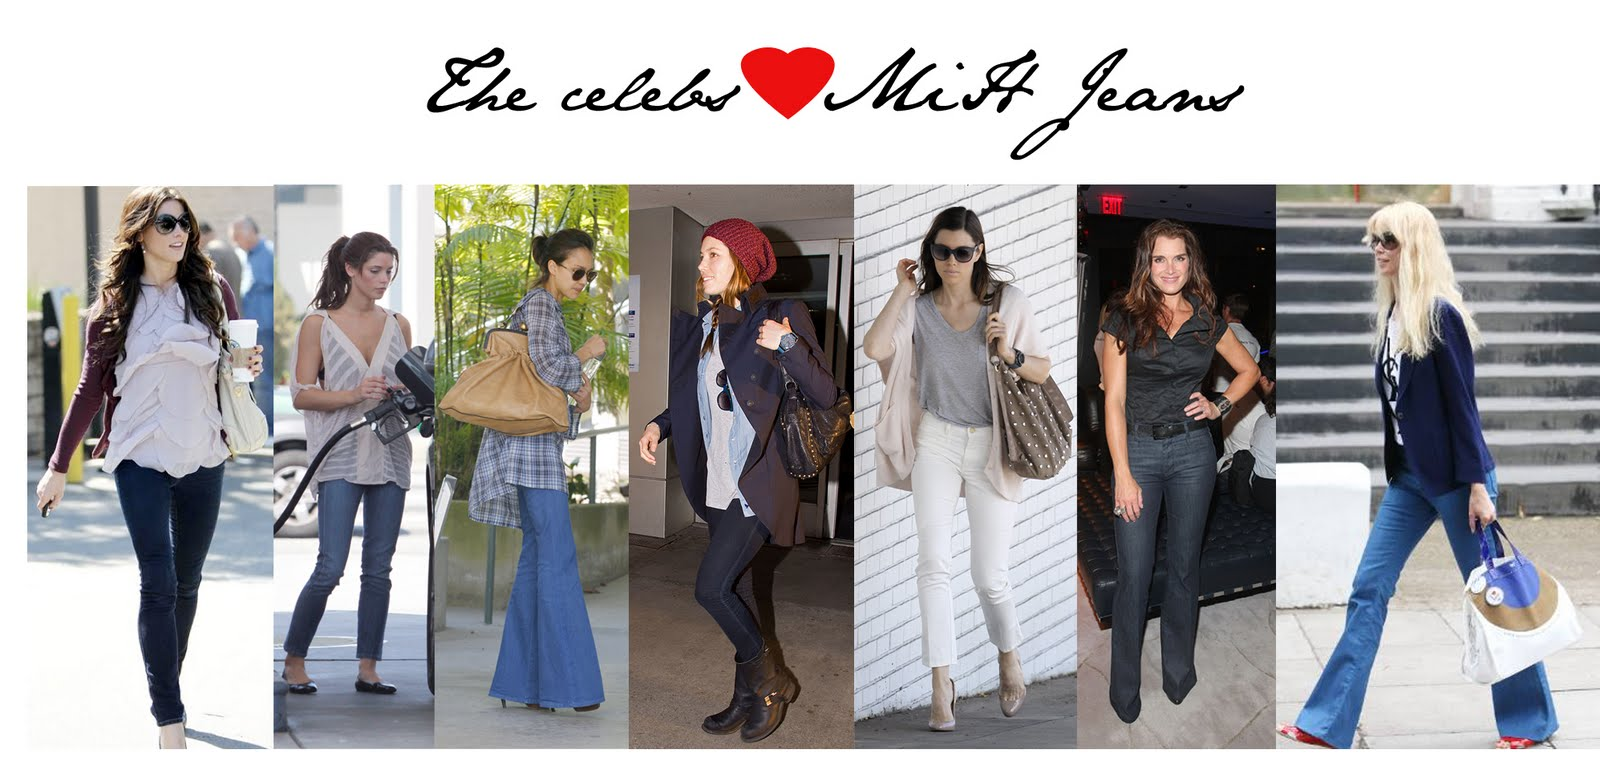 http://3.bp.blogspot.com/_NuQ1asHchXU/S-LgC31fmgI/AAAAAAAAFAA/aLPTdfwelAs/s1600/mih+jeans.JPG